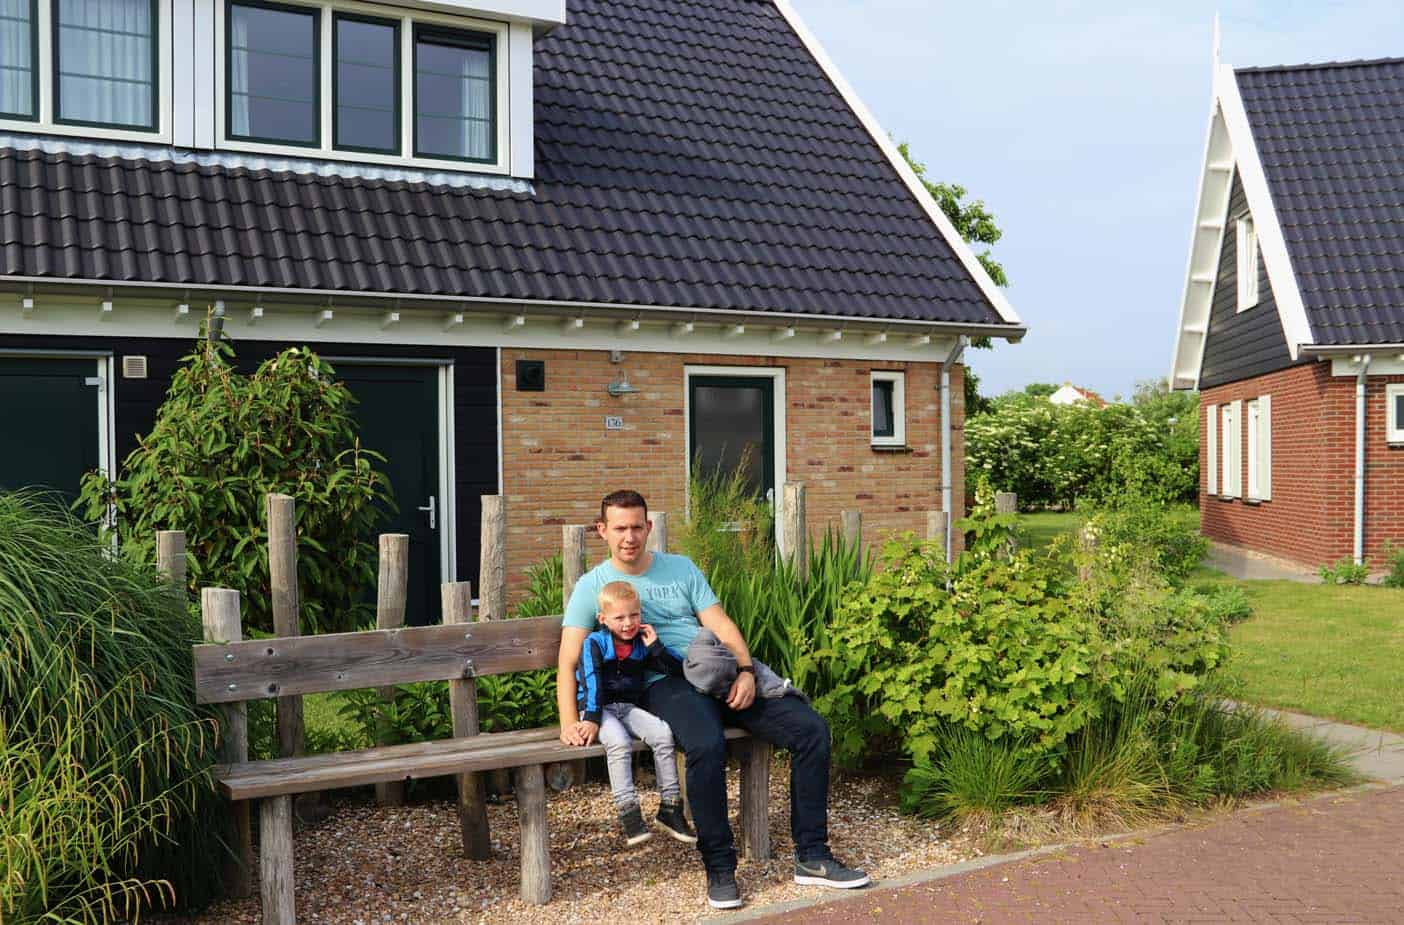 park Landal Resort Haamstede